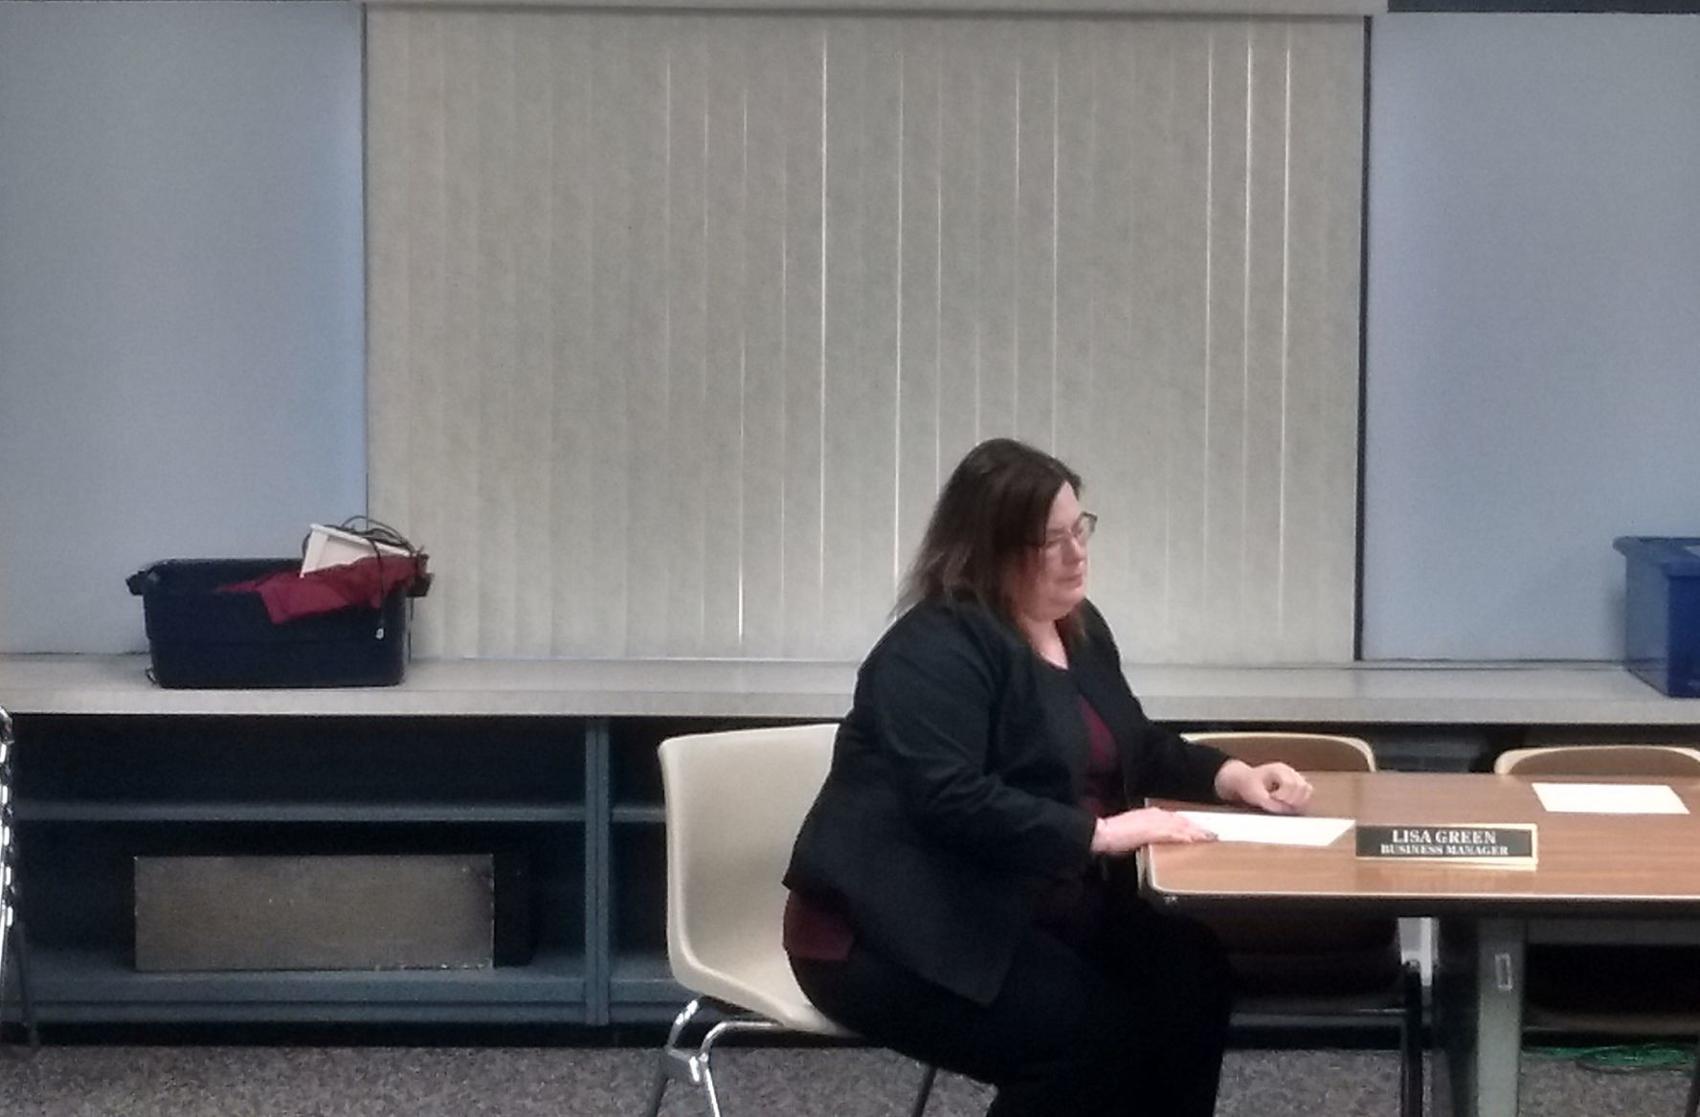 Auburn schools administrator on leave to resign